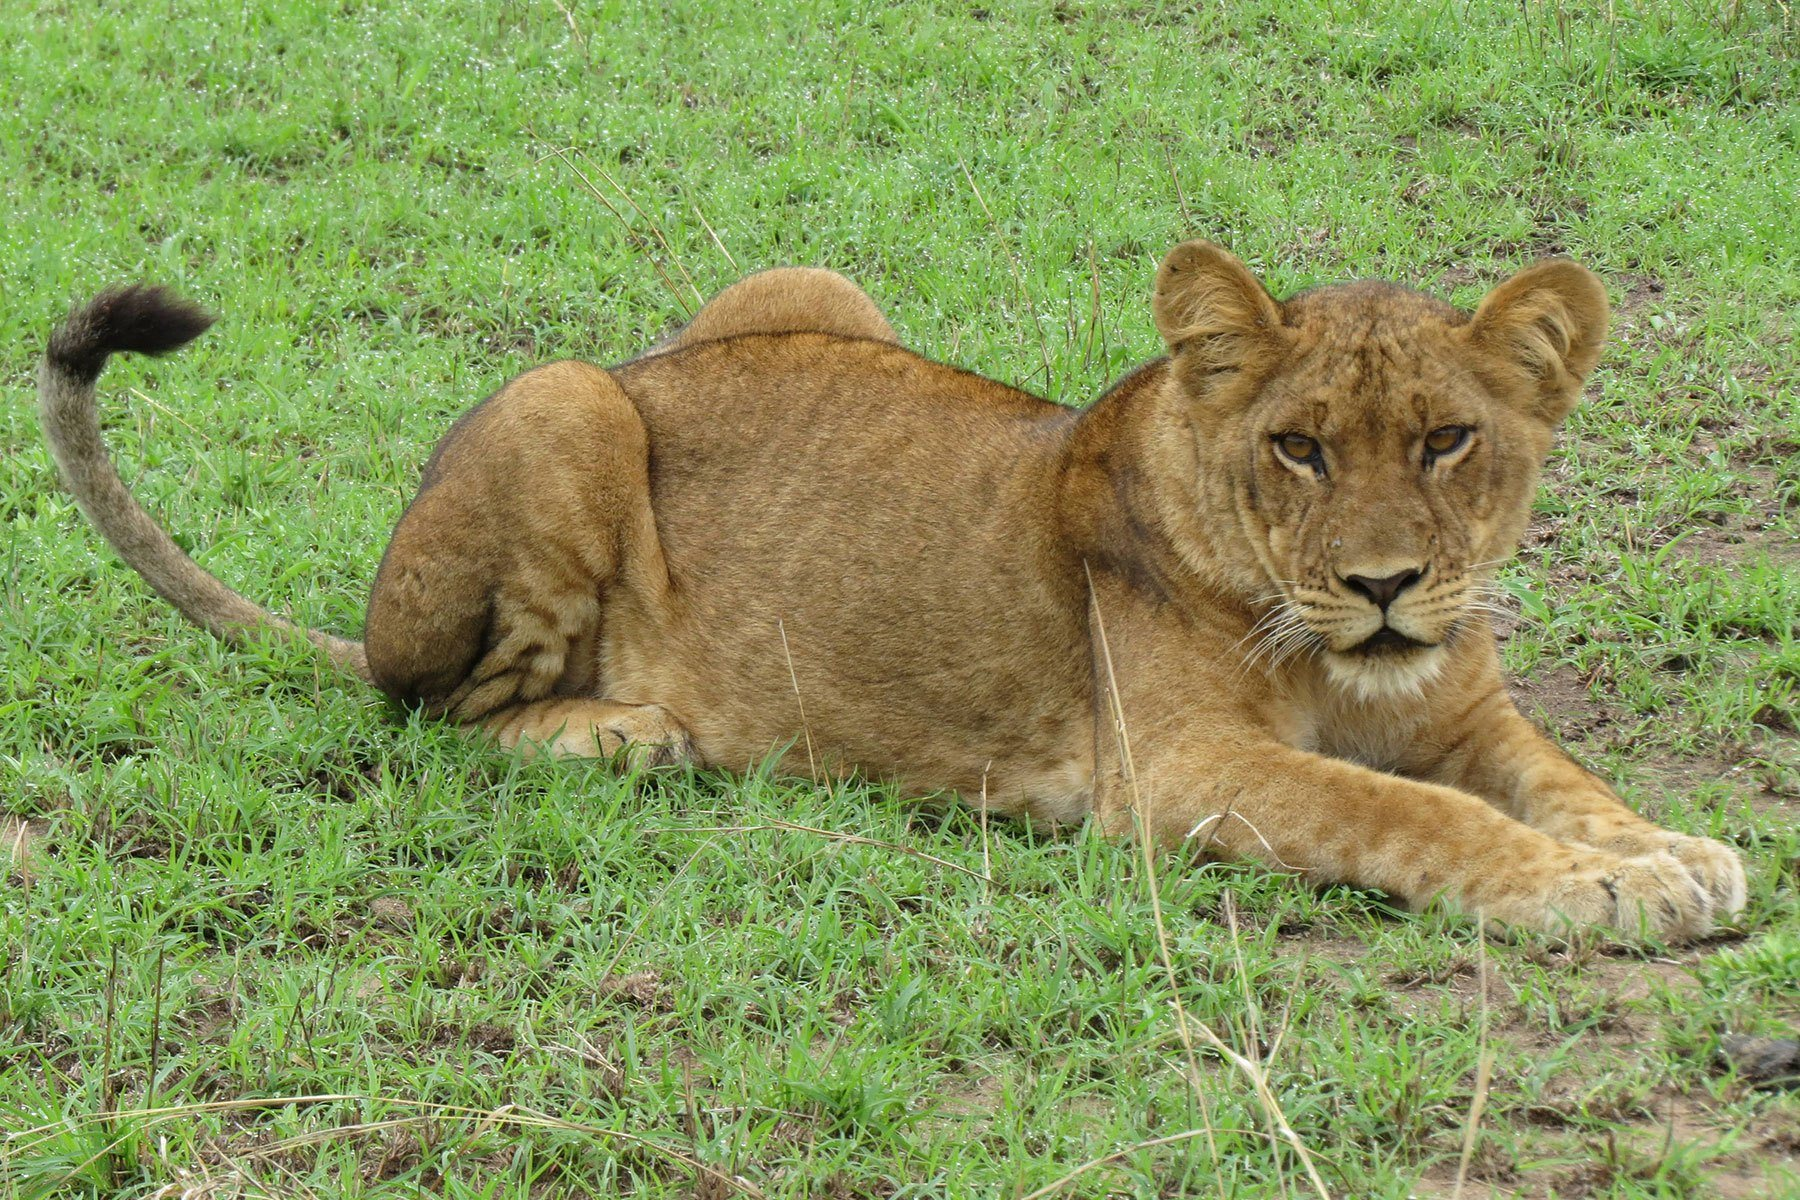 johnnie uganda safaris